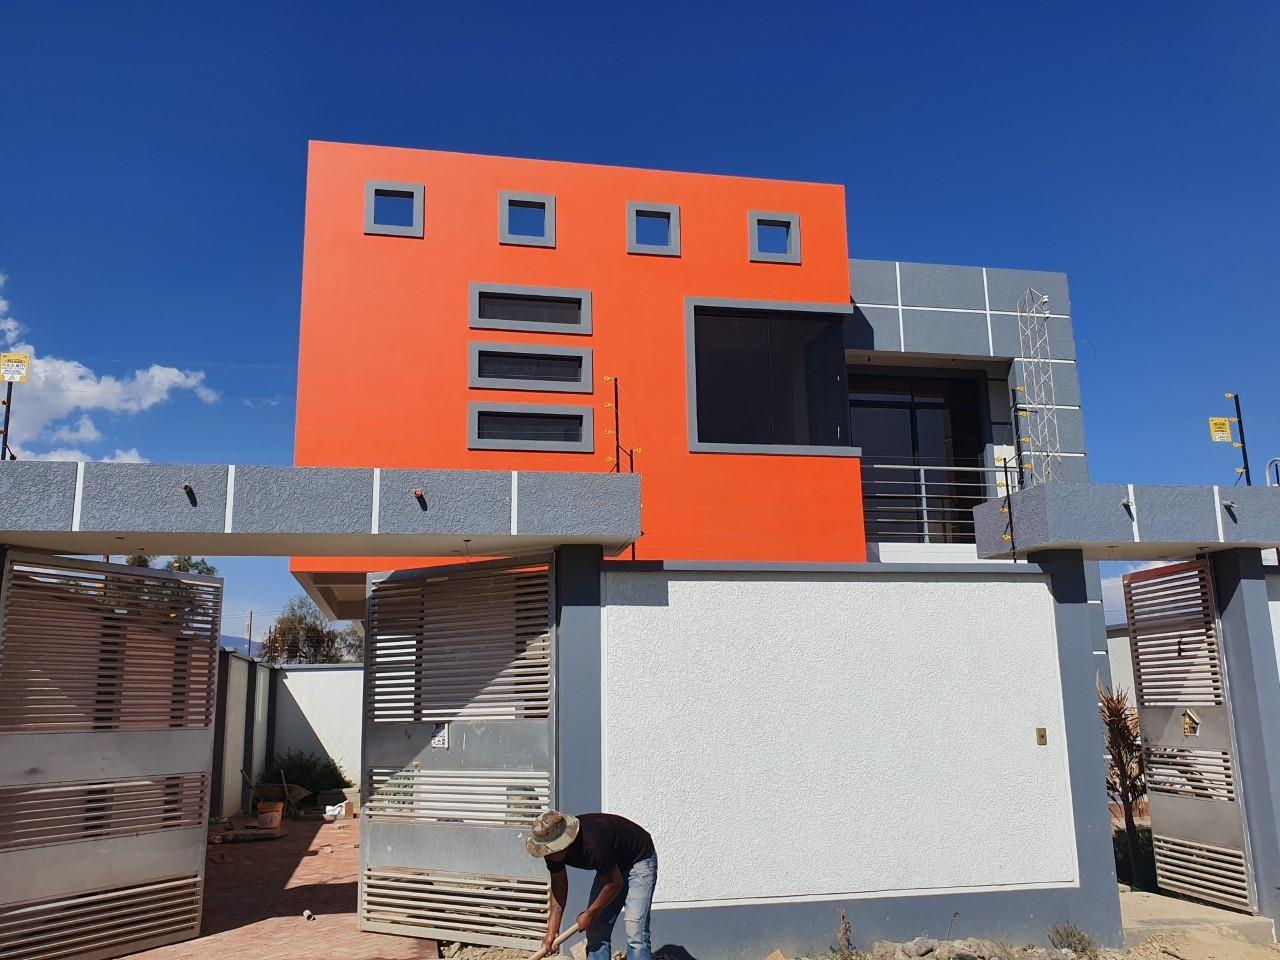 Casa en Venta Calle La Paz, Barrio Kami, Zona Don Bosco  Foto 4